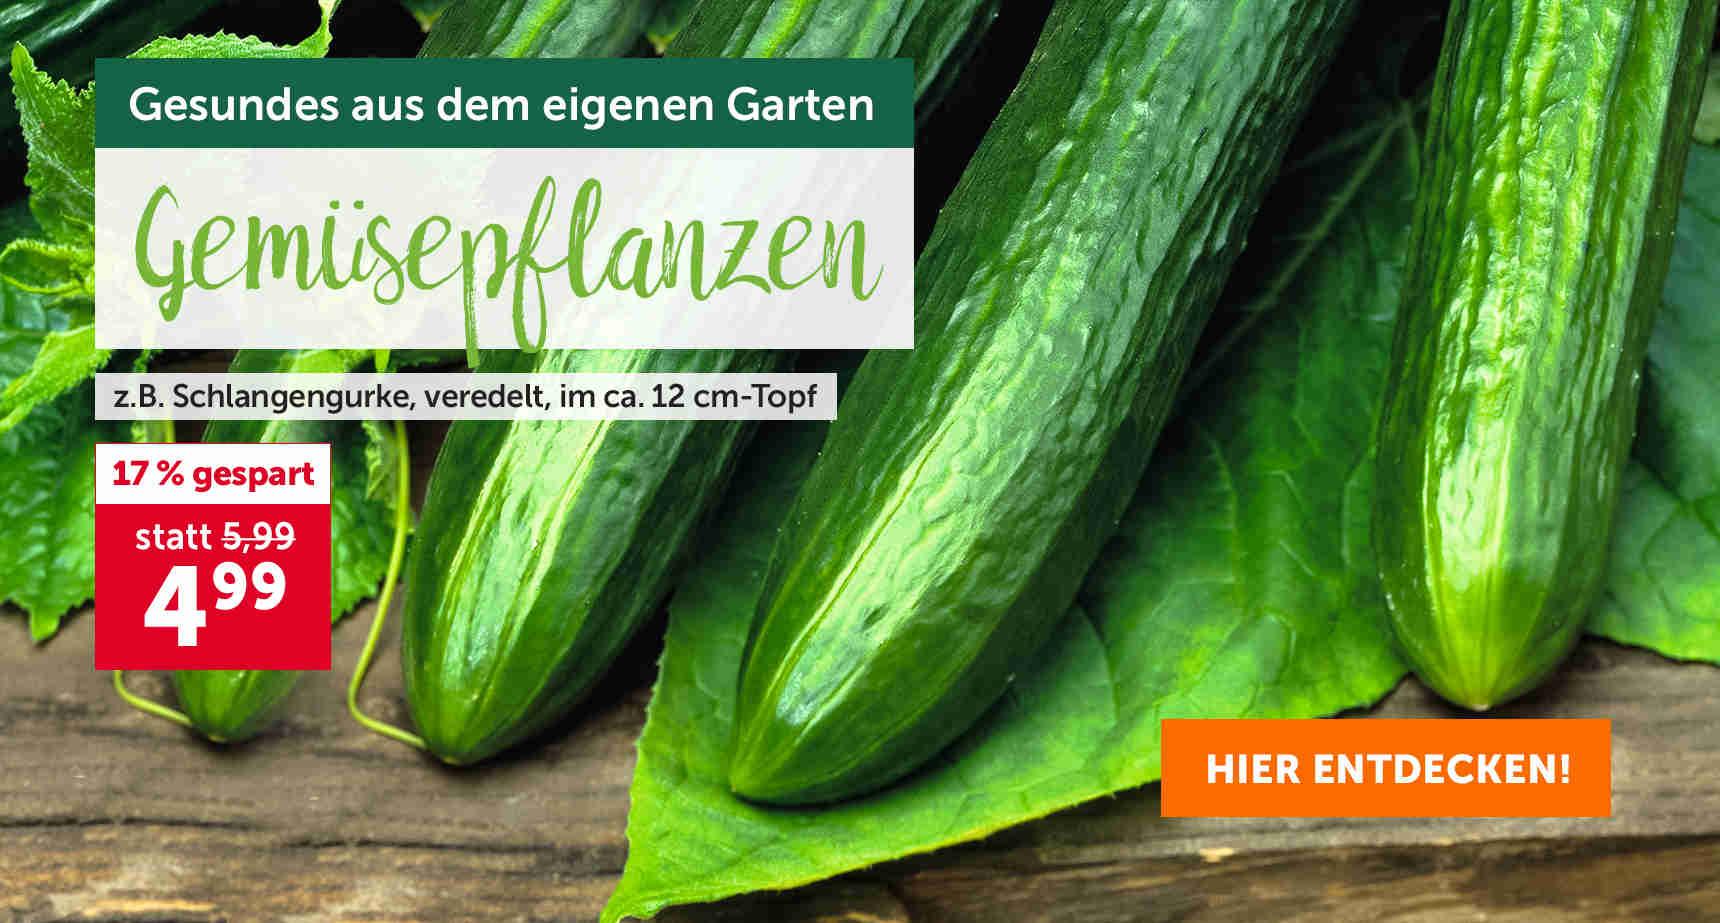 +++ (2) Gemüsepflanzen +++ - 3